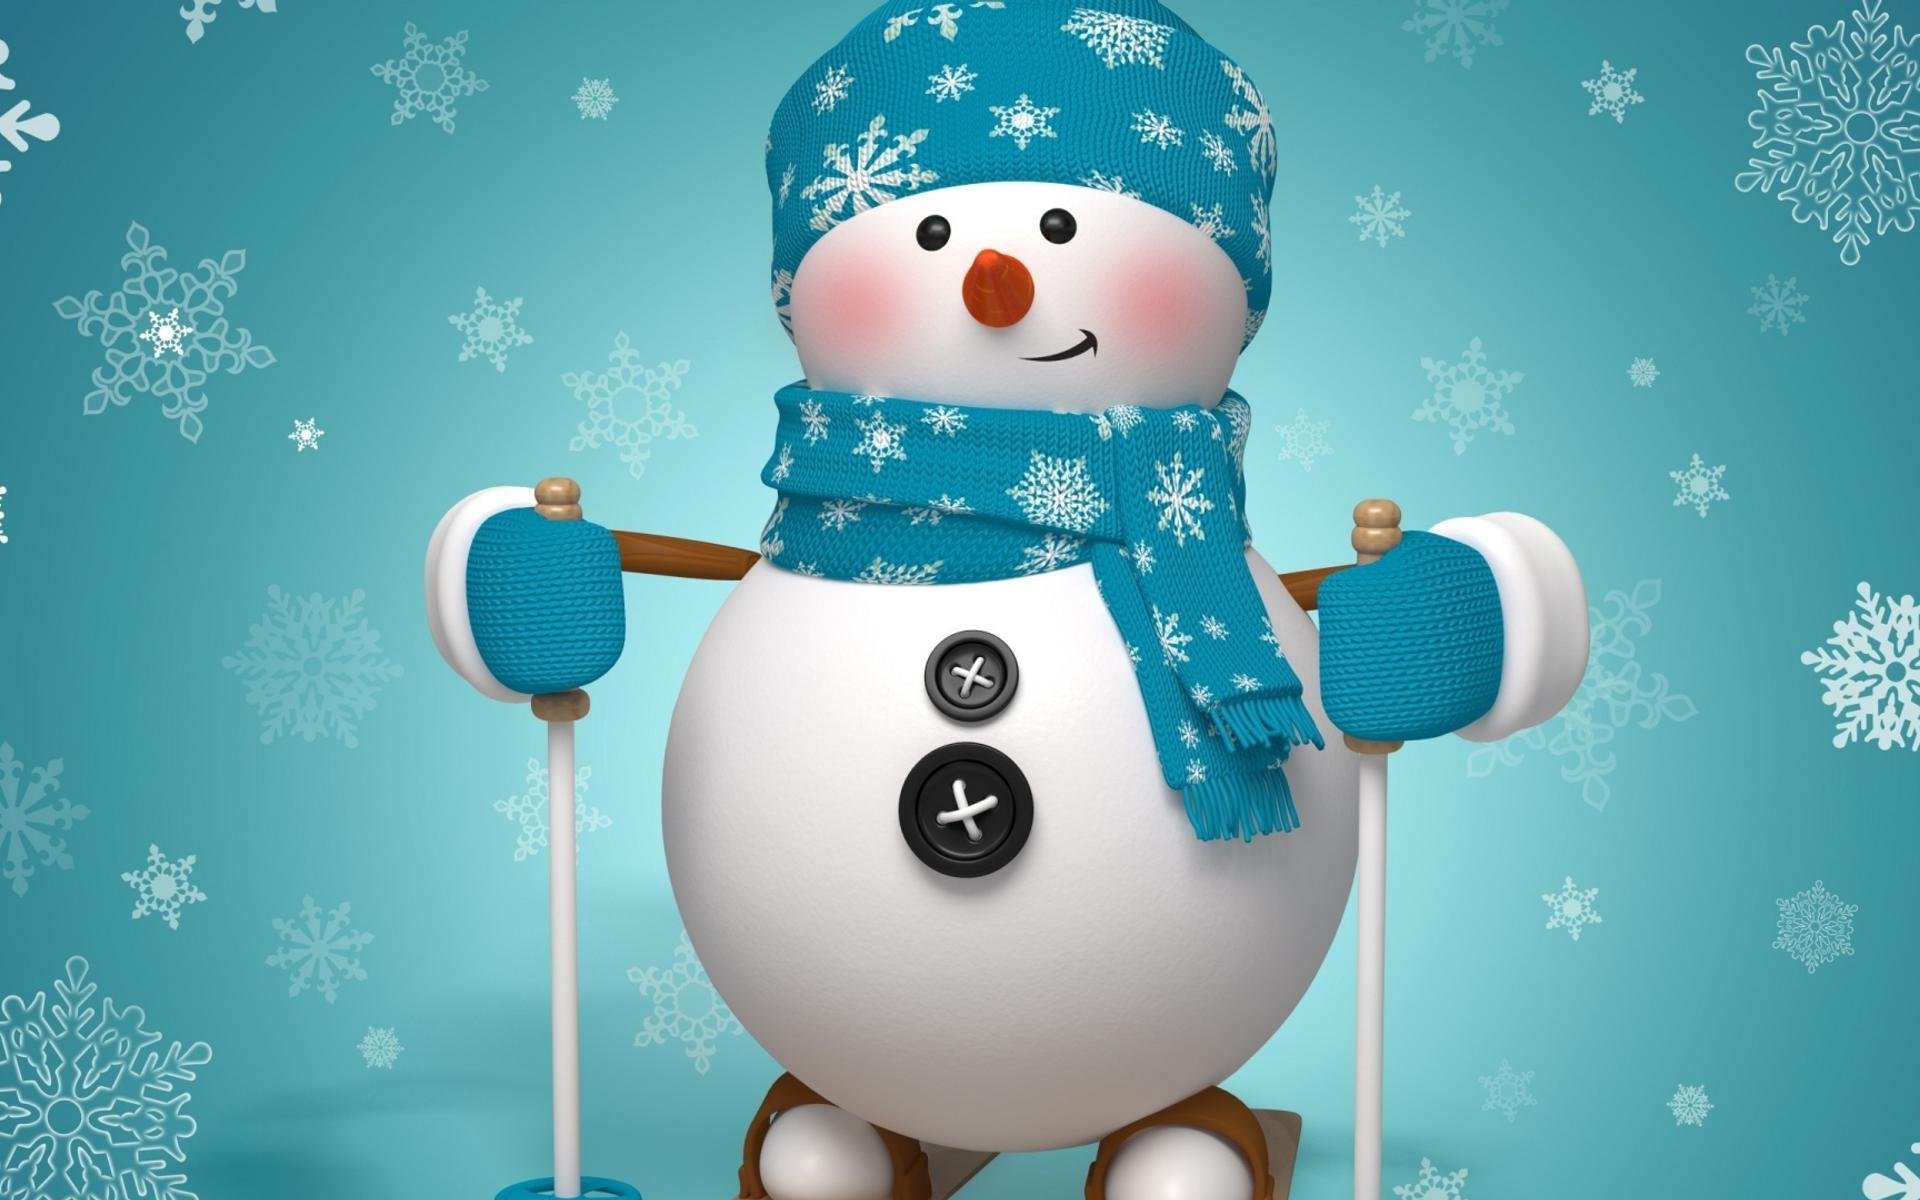 A snowman ready to ski - Funny wallpaper Wallpaper Download 1920x1200 3eb5c416daa